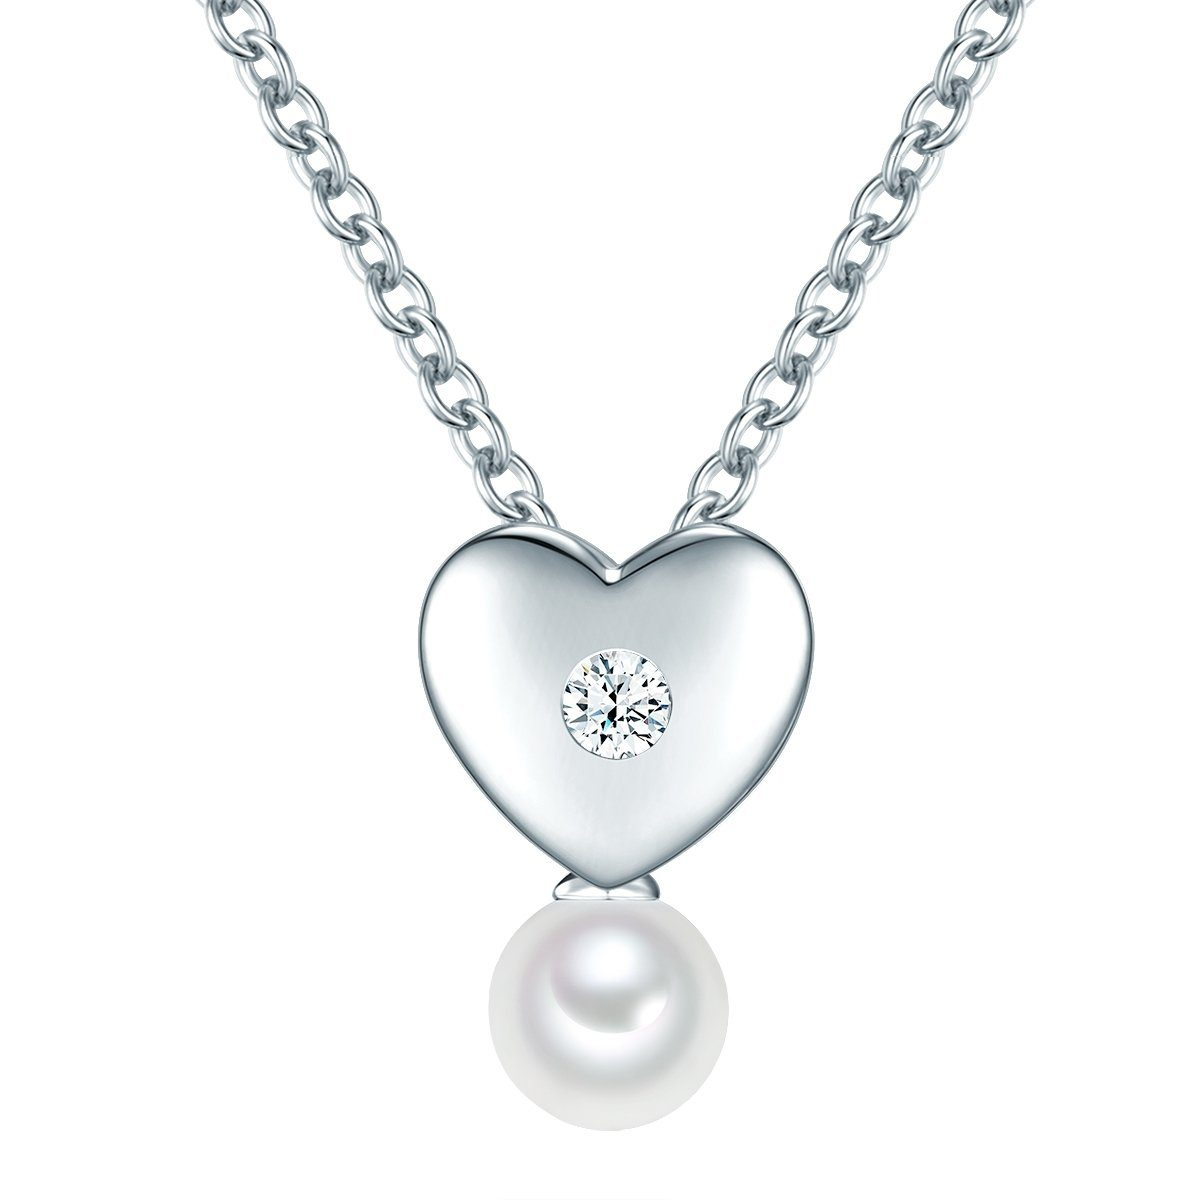 Valero Pearls Gliederkette Y907 | Schmuck > Halsketten > Gliederketten | Valero Pearls